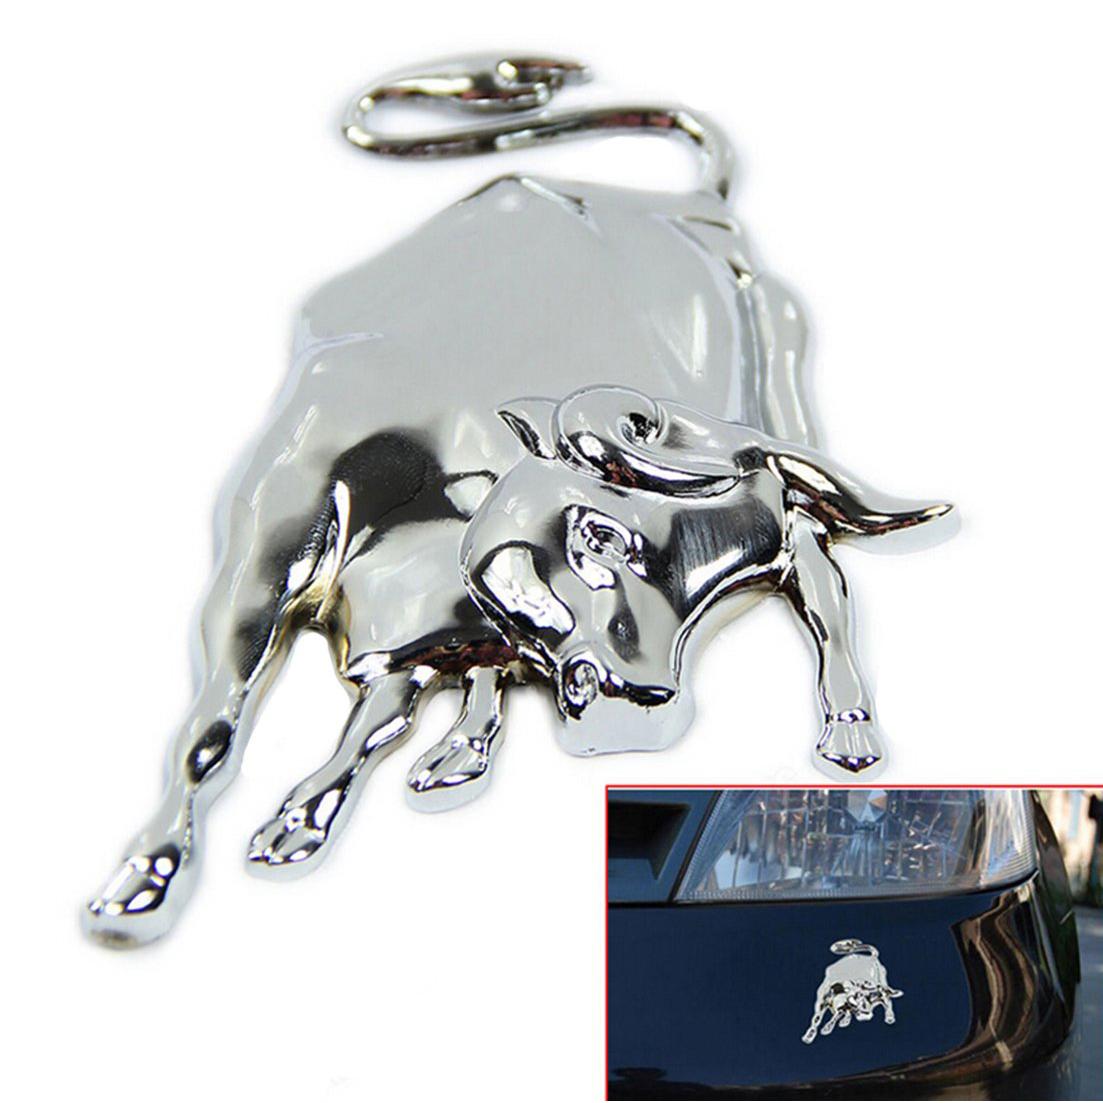 3d silver chrome metall stier emblem selbst lkw aufkleber gy ebay. Black Bedroom Furniture Sets. Home Design Ideas